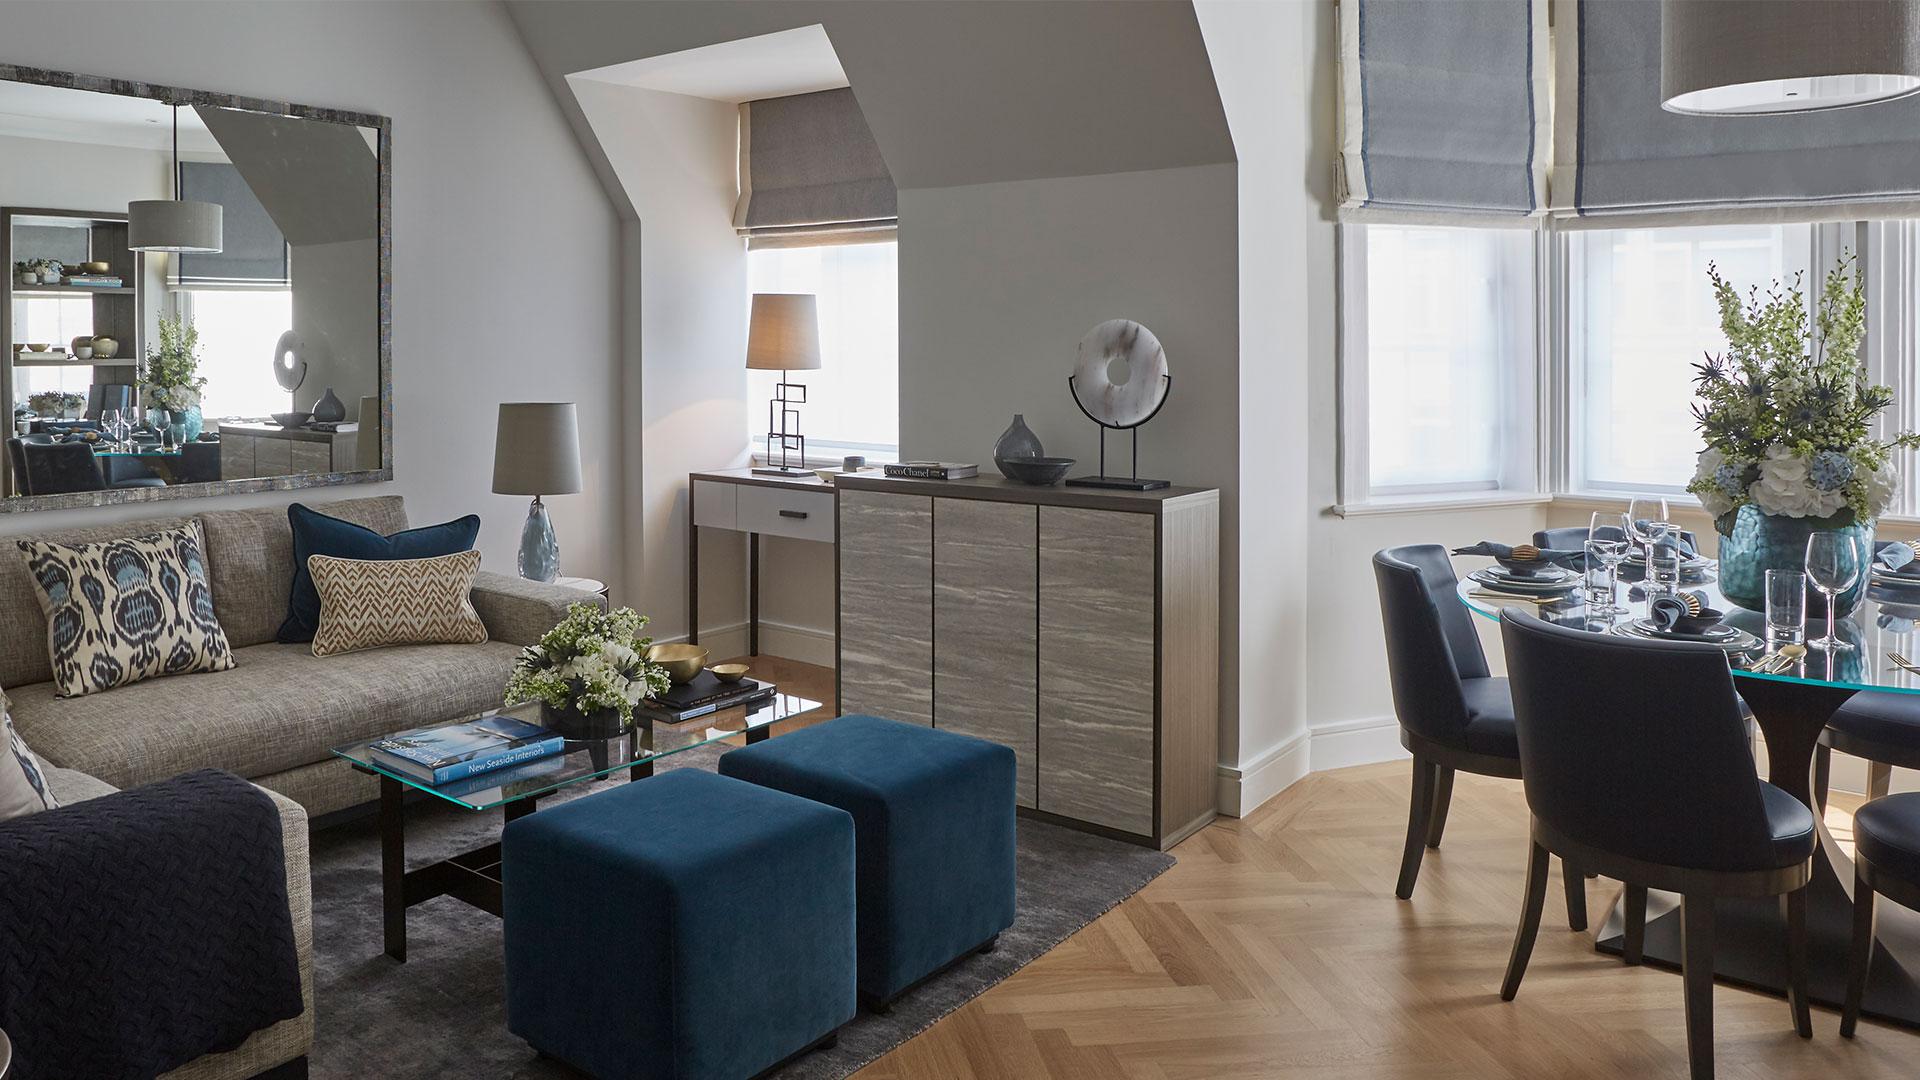 Luxurious Apartment & Penthouse Designs - Chairish Blog